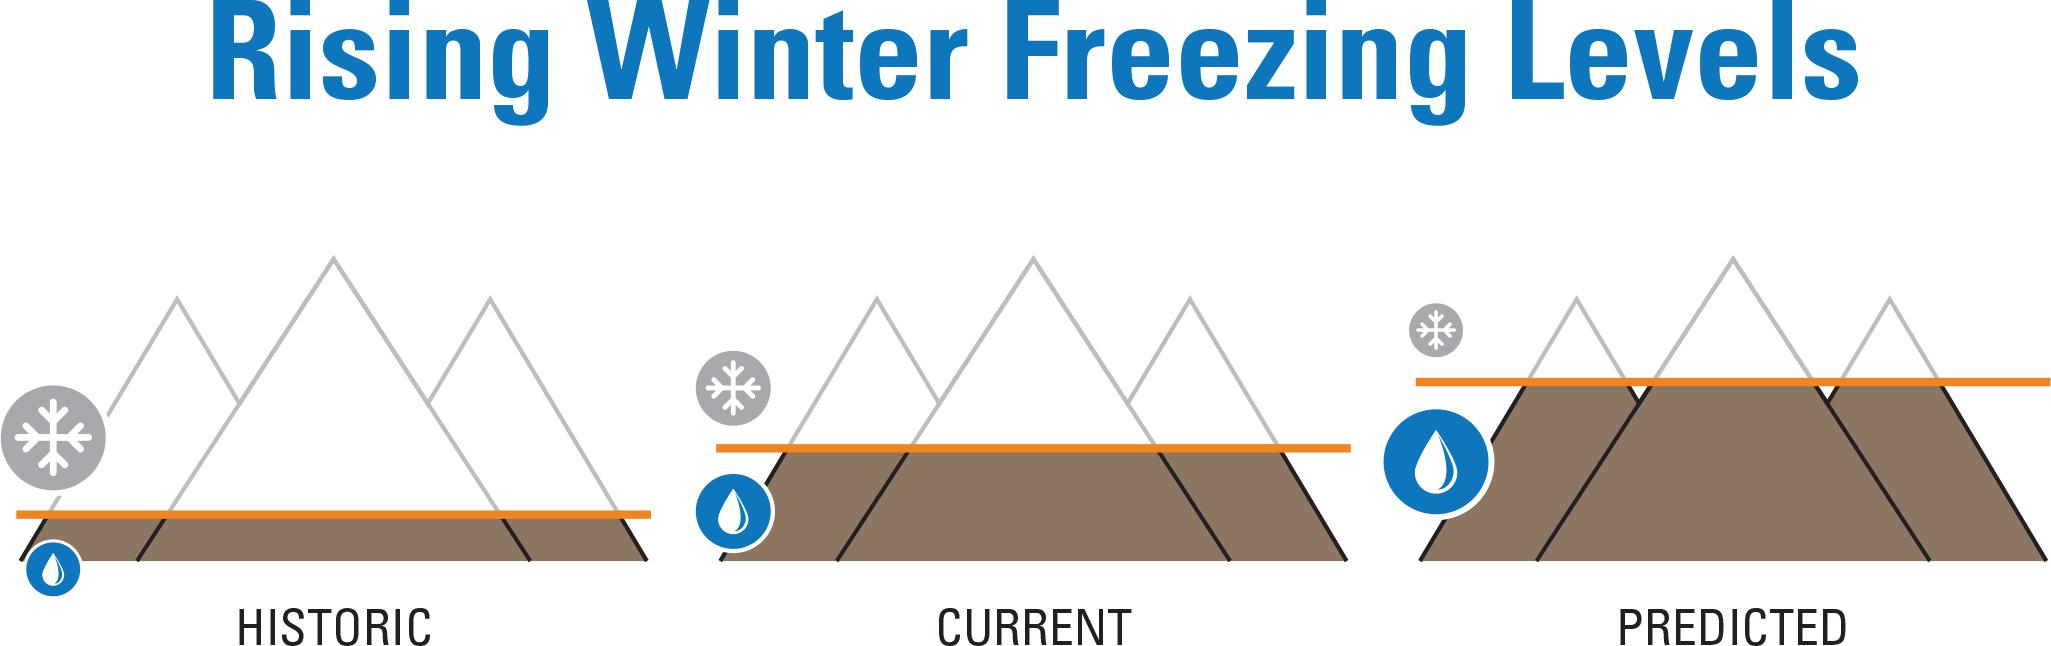 SwinClimate_SC2_WinterFreezingLevels.jpg